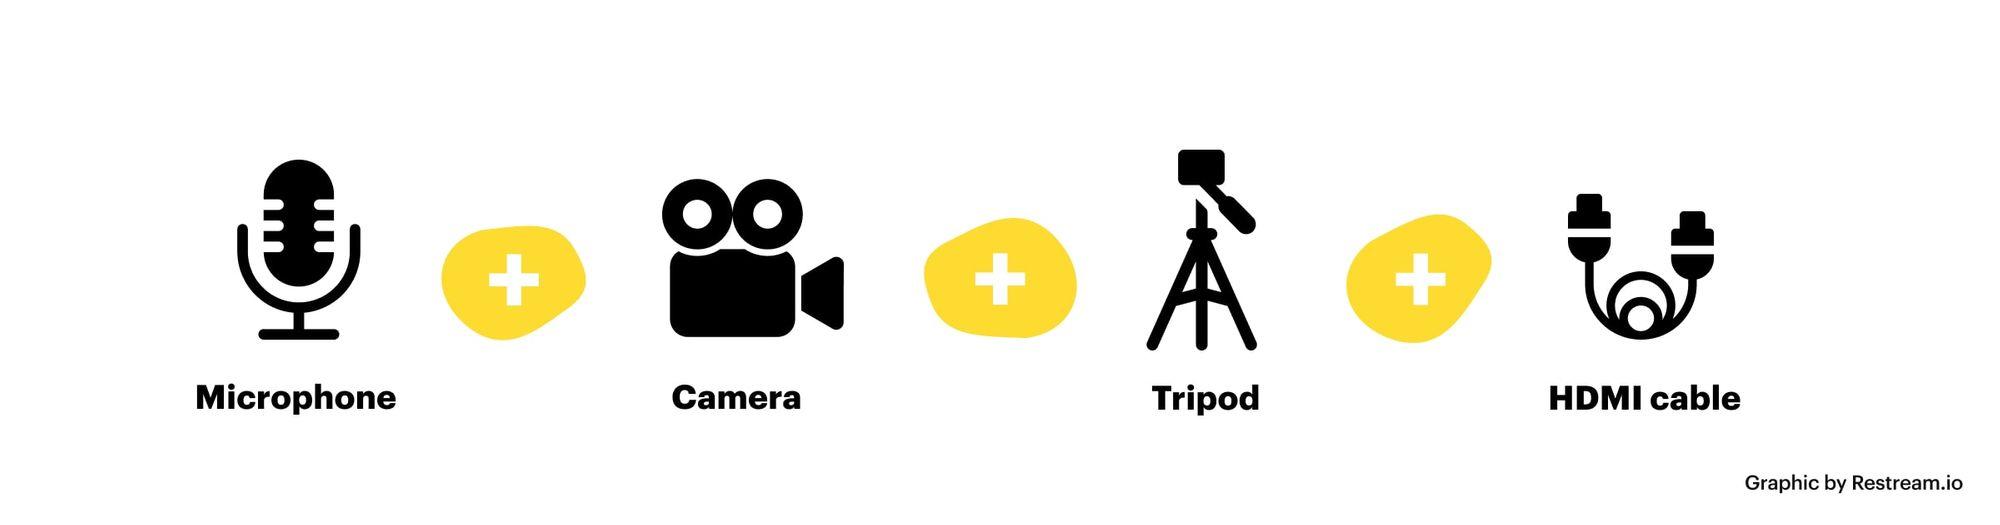 live streaming accessories: microphone, camera, tripod, hdmi cable